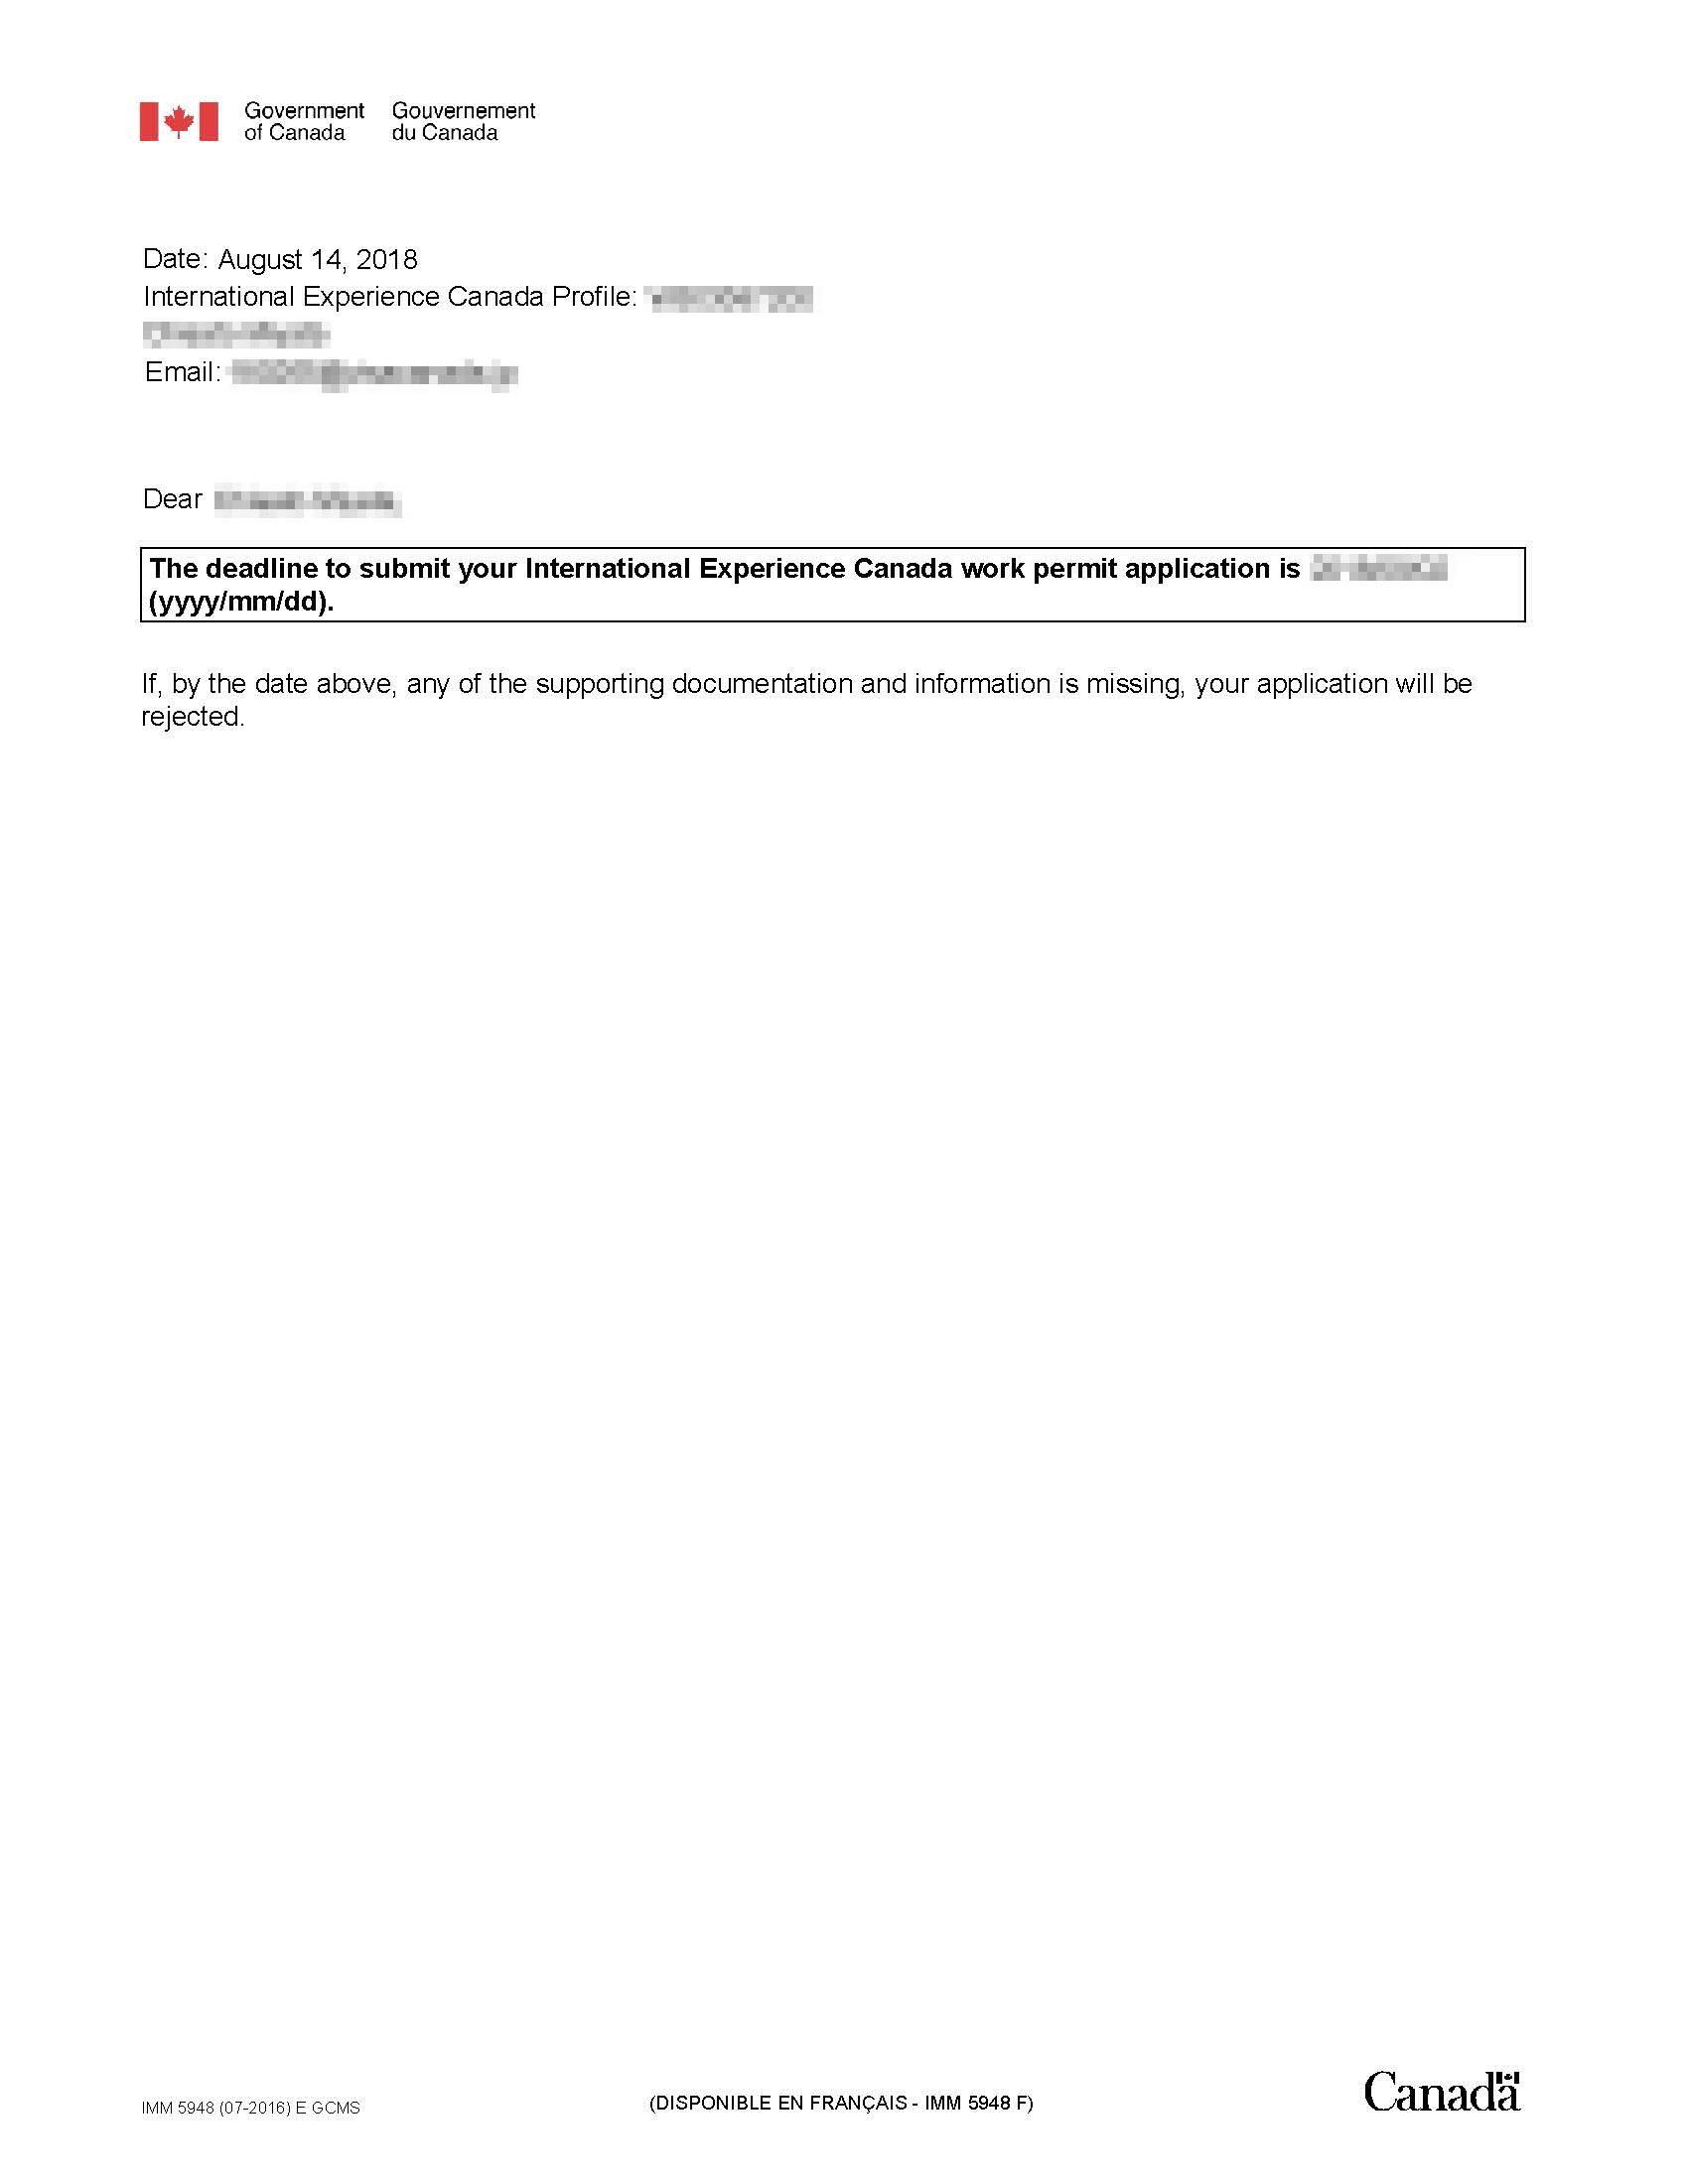 step 6.ITA Accept後に発行されるレター(申請期限記載)